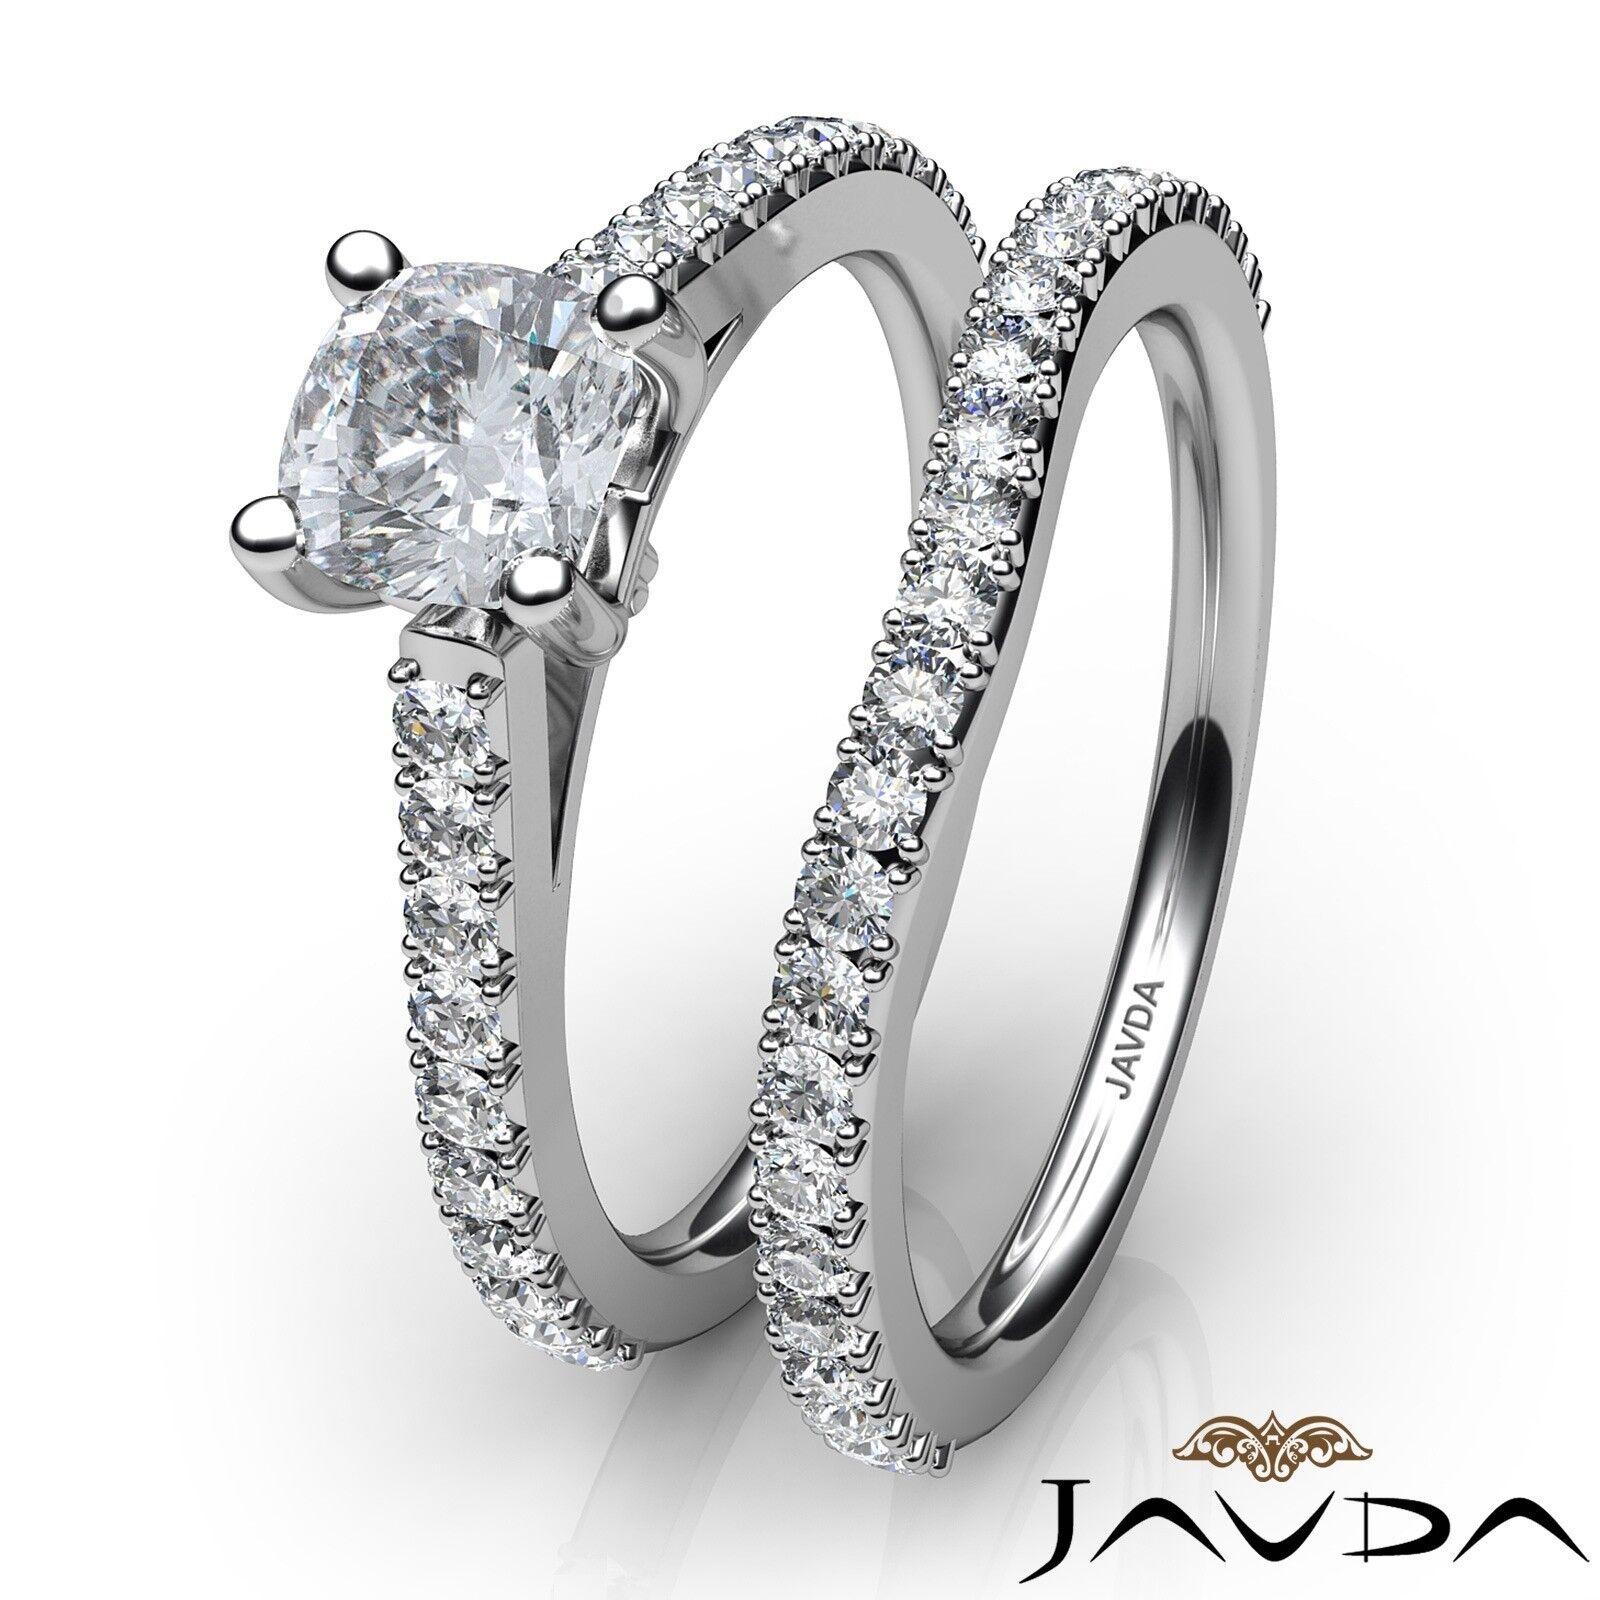 1.51ctw Double Prong Bridal Set Cushion Diamond Engagement Ring GIA F-VS1 W Gold 3